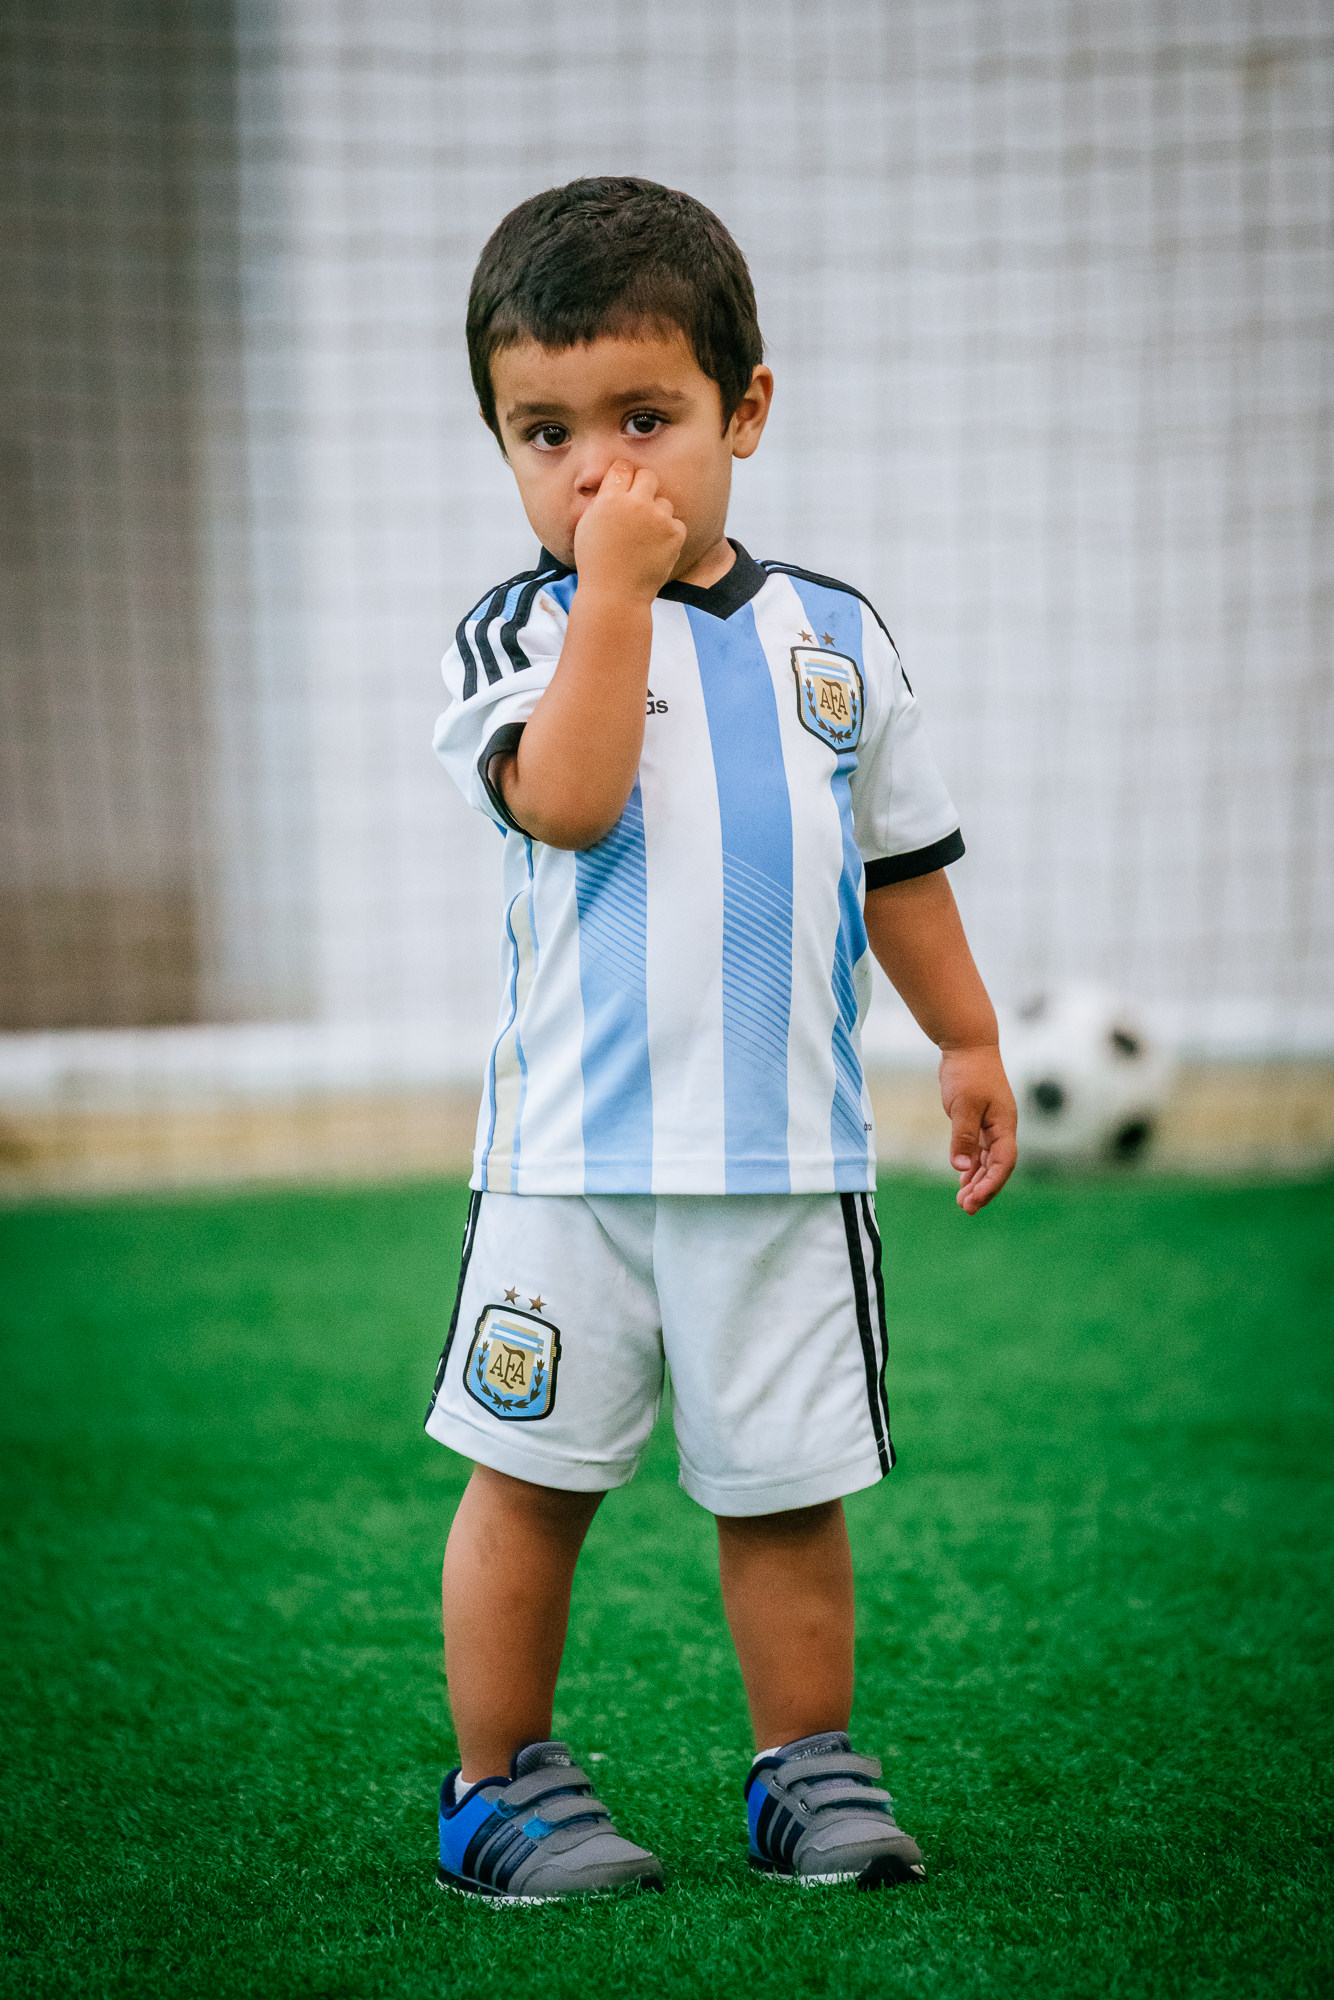 2016 06 - FGO Soccer Facebook-1005.jpg